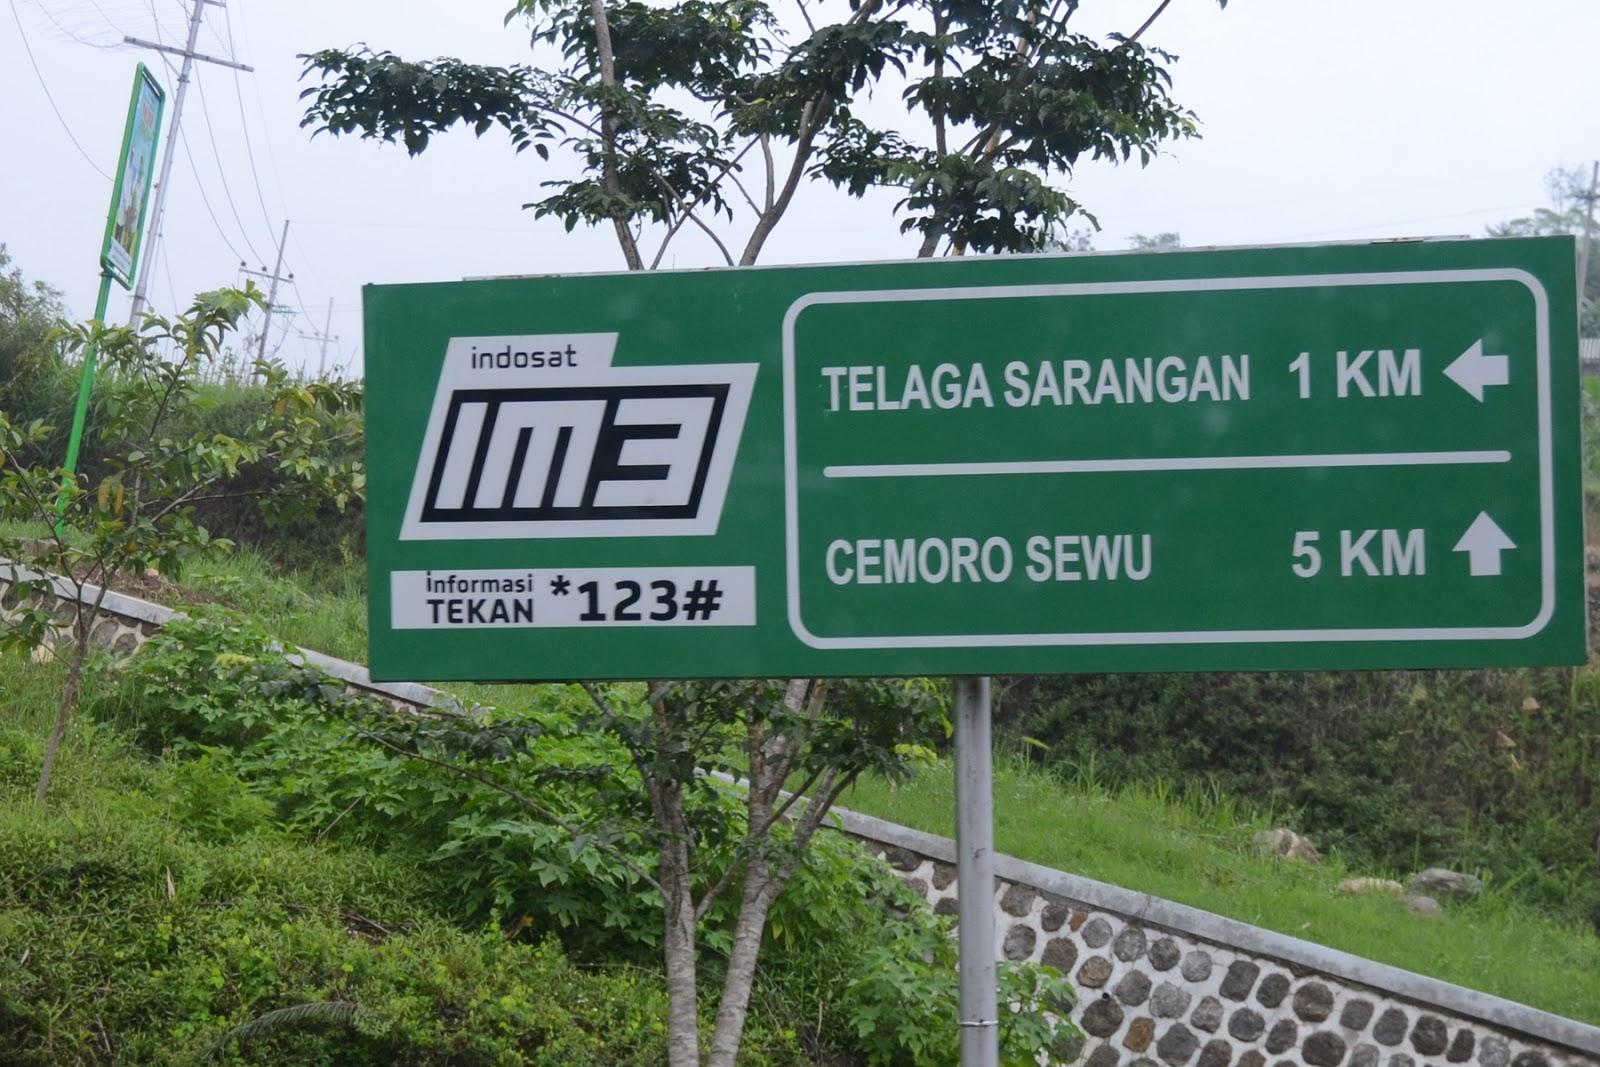 Wisata Telaga Sarangan Magetan Jawa Timur Wong Kampung Pinggir Tersedia